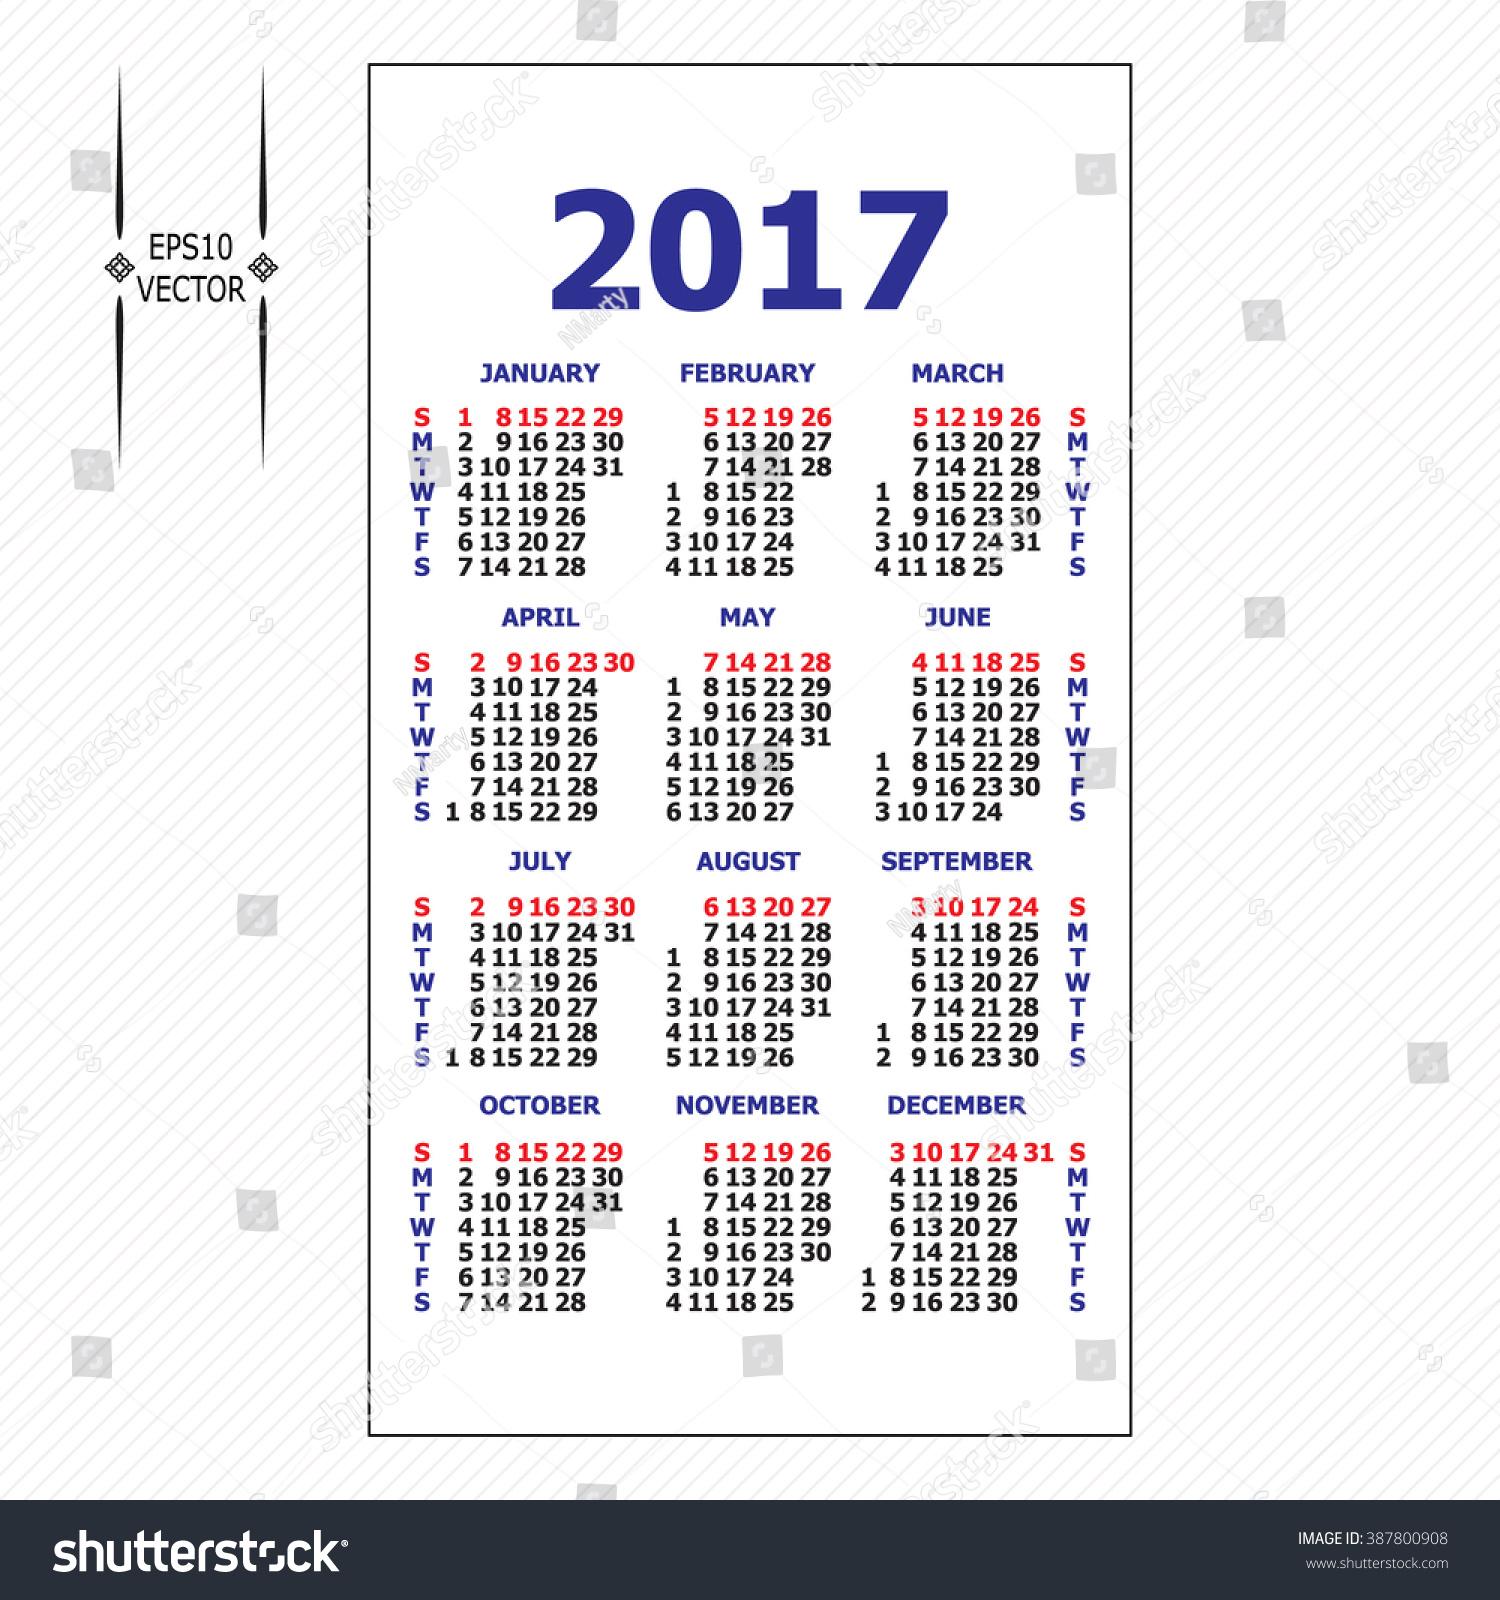 blank calendar grid